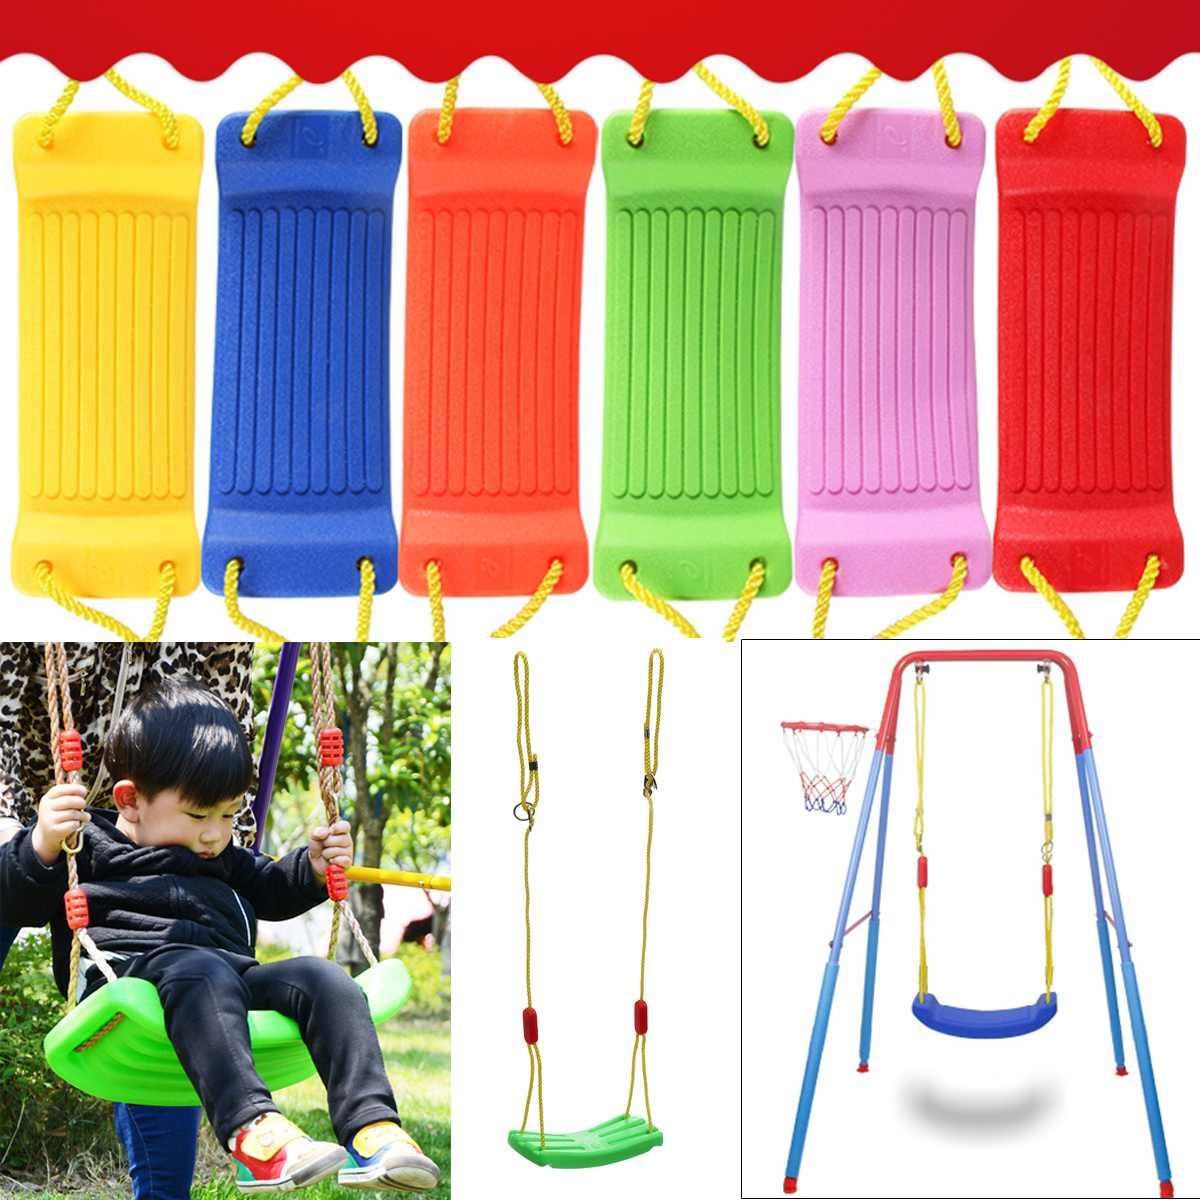 Baby Kids Children Toy Indoor Outdoor Garden Swing Seat U Type Adjustable  Rope Plastic Candy Color 37X17Cm Indoor Sport Within Nest Swings With Adjustable Ropes (View 14 of 25)